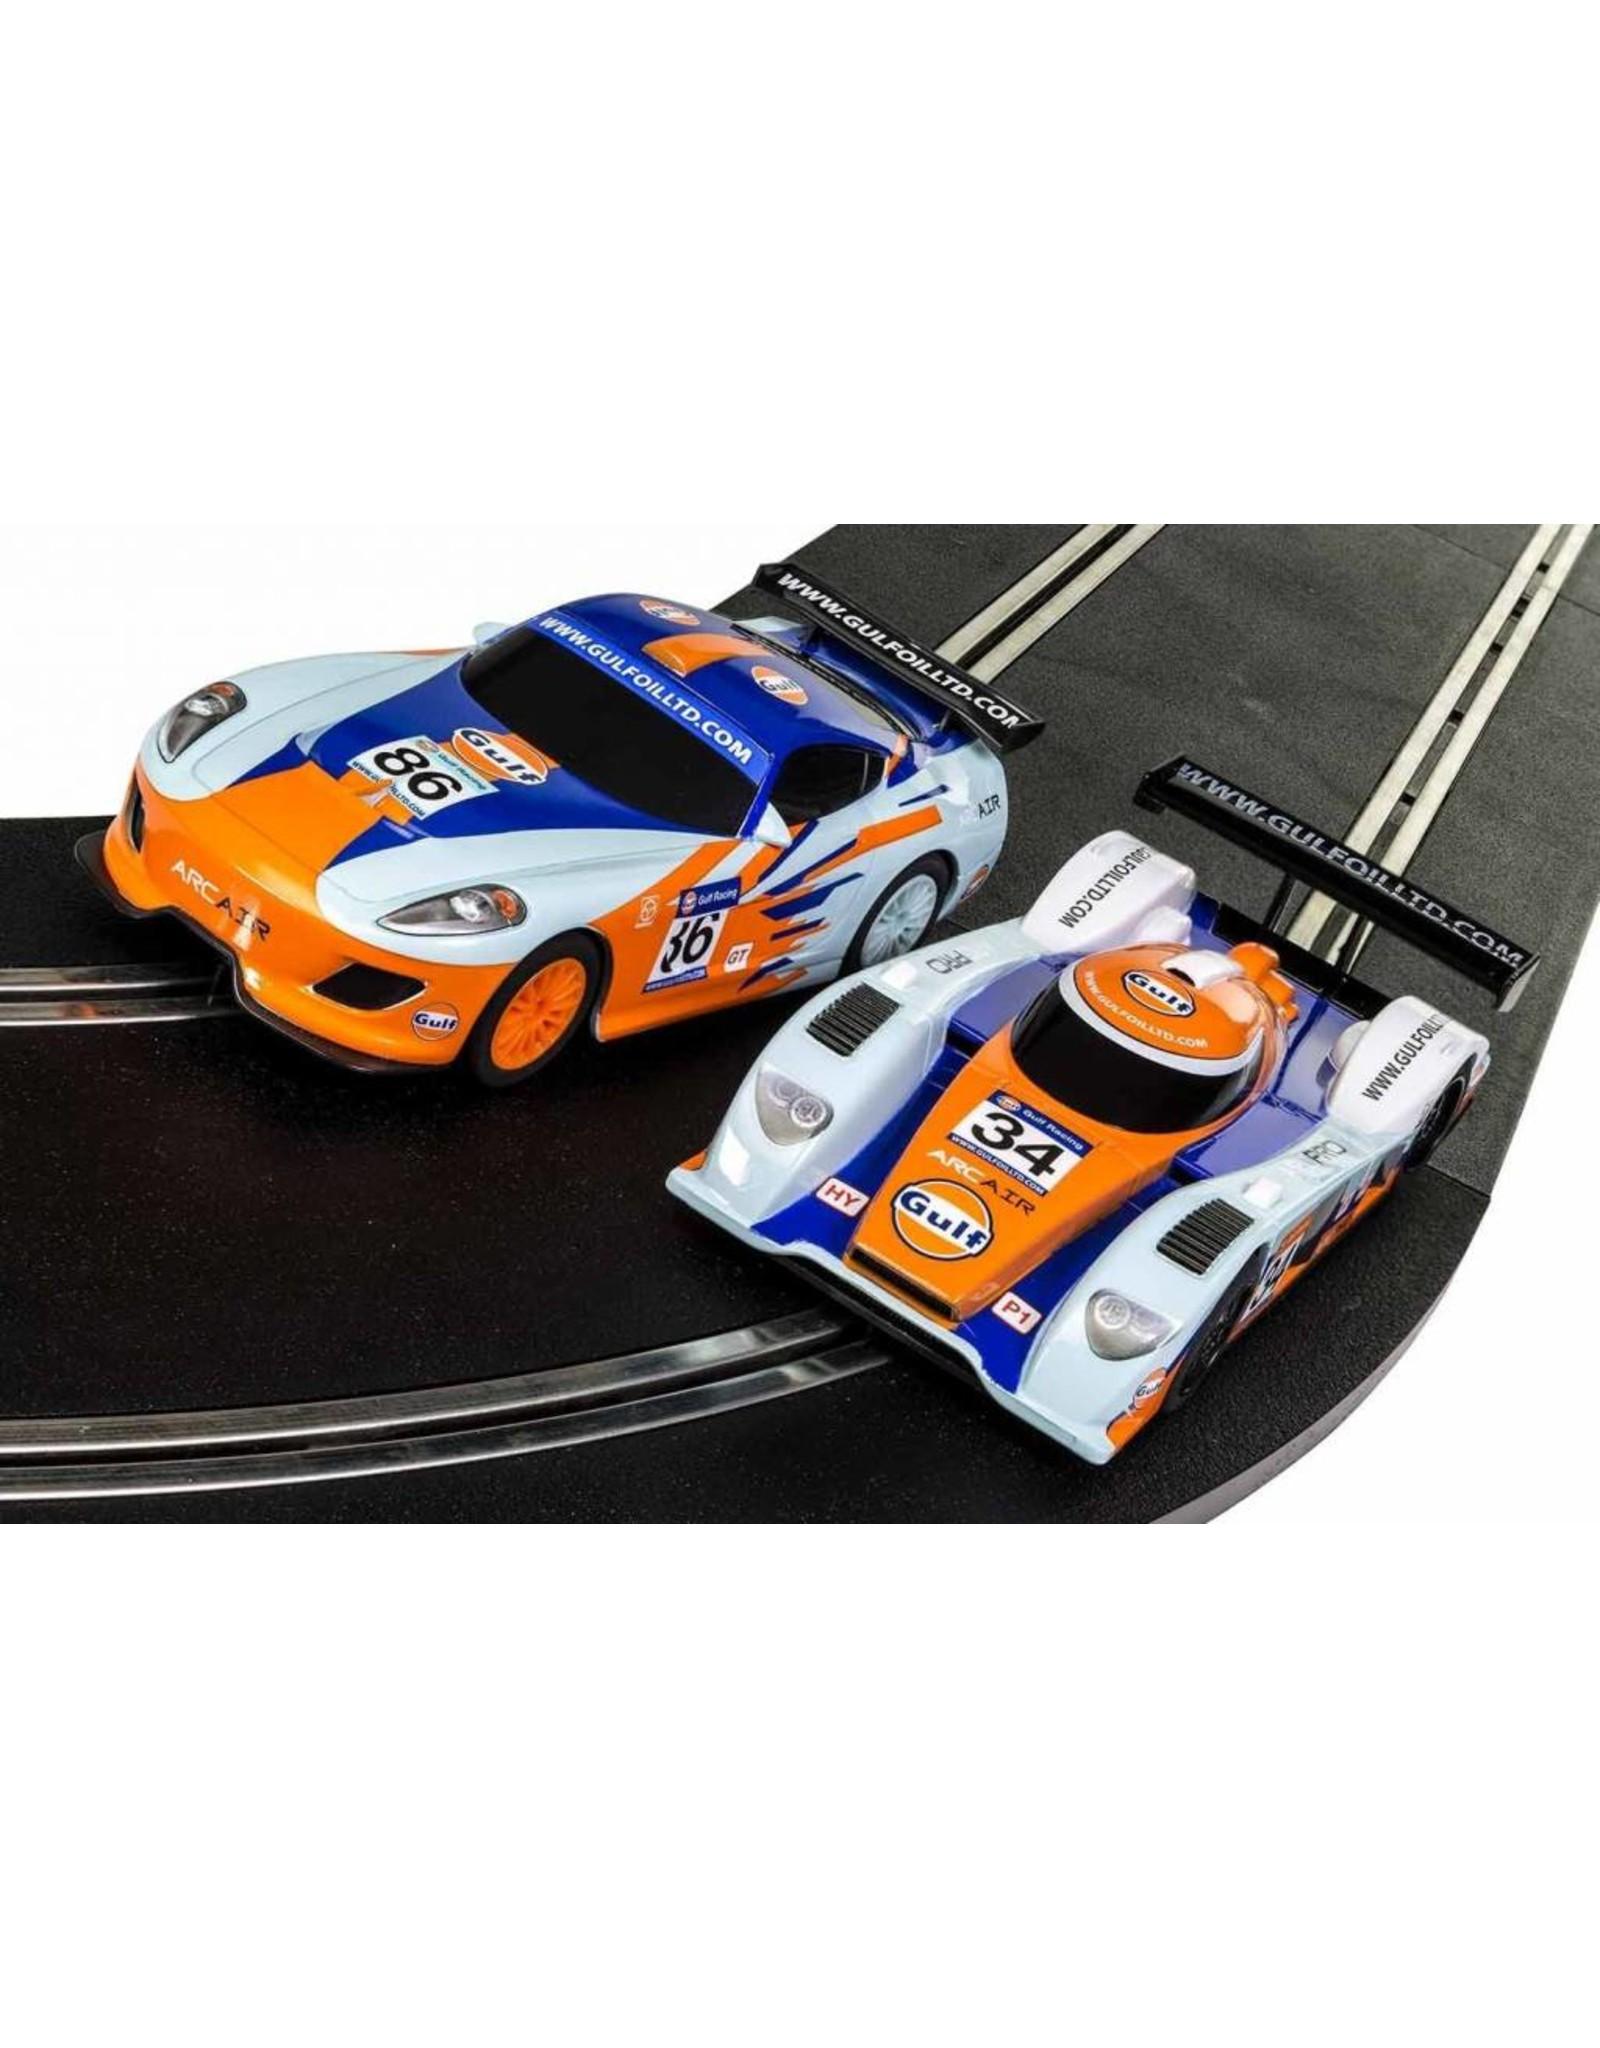 Scalextric Gulf Racing  - 1:32 - Scalextric